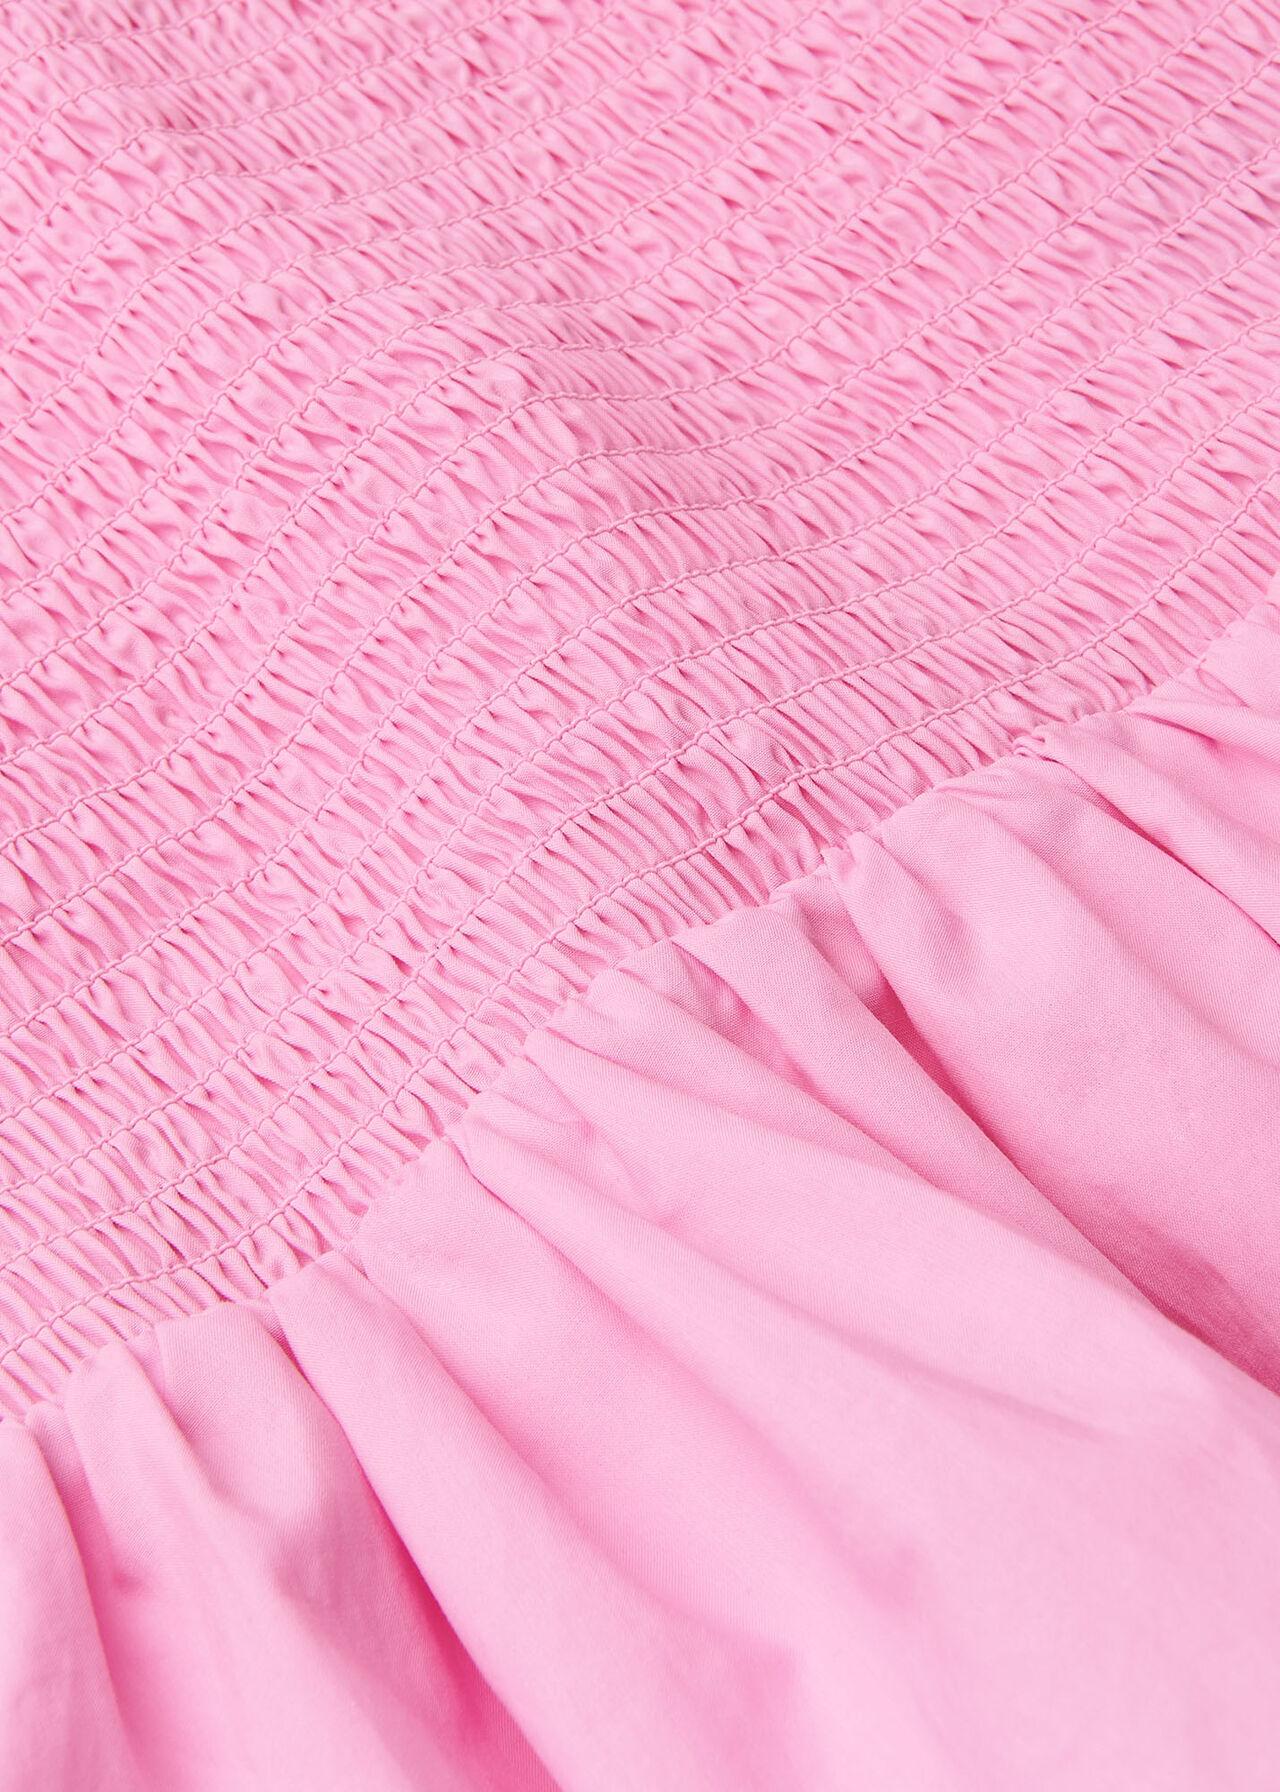 Shirred Detail Peplum Top